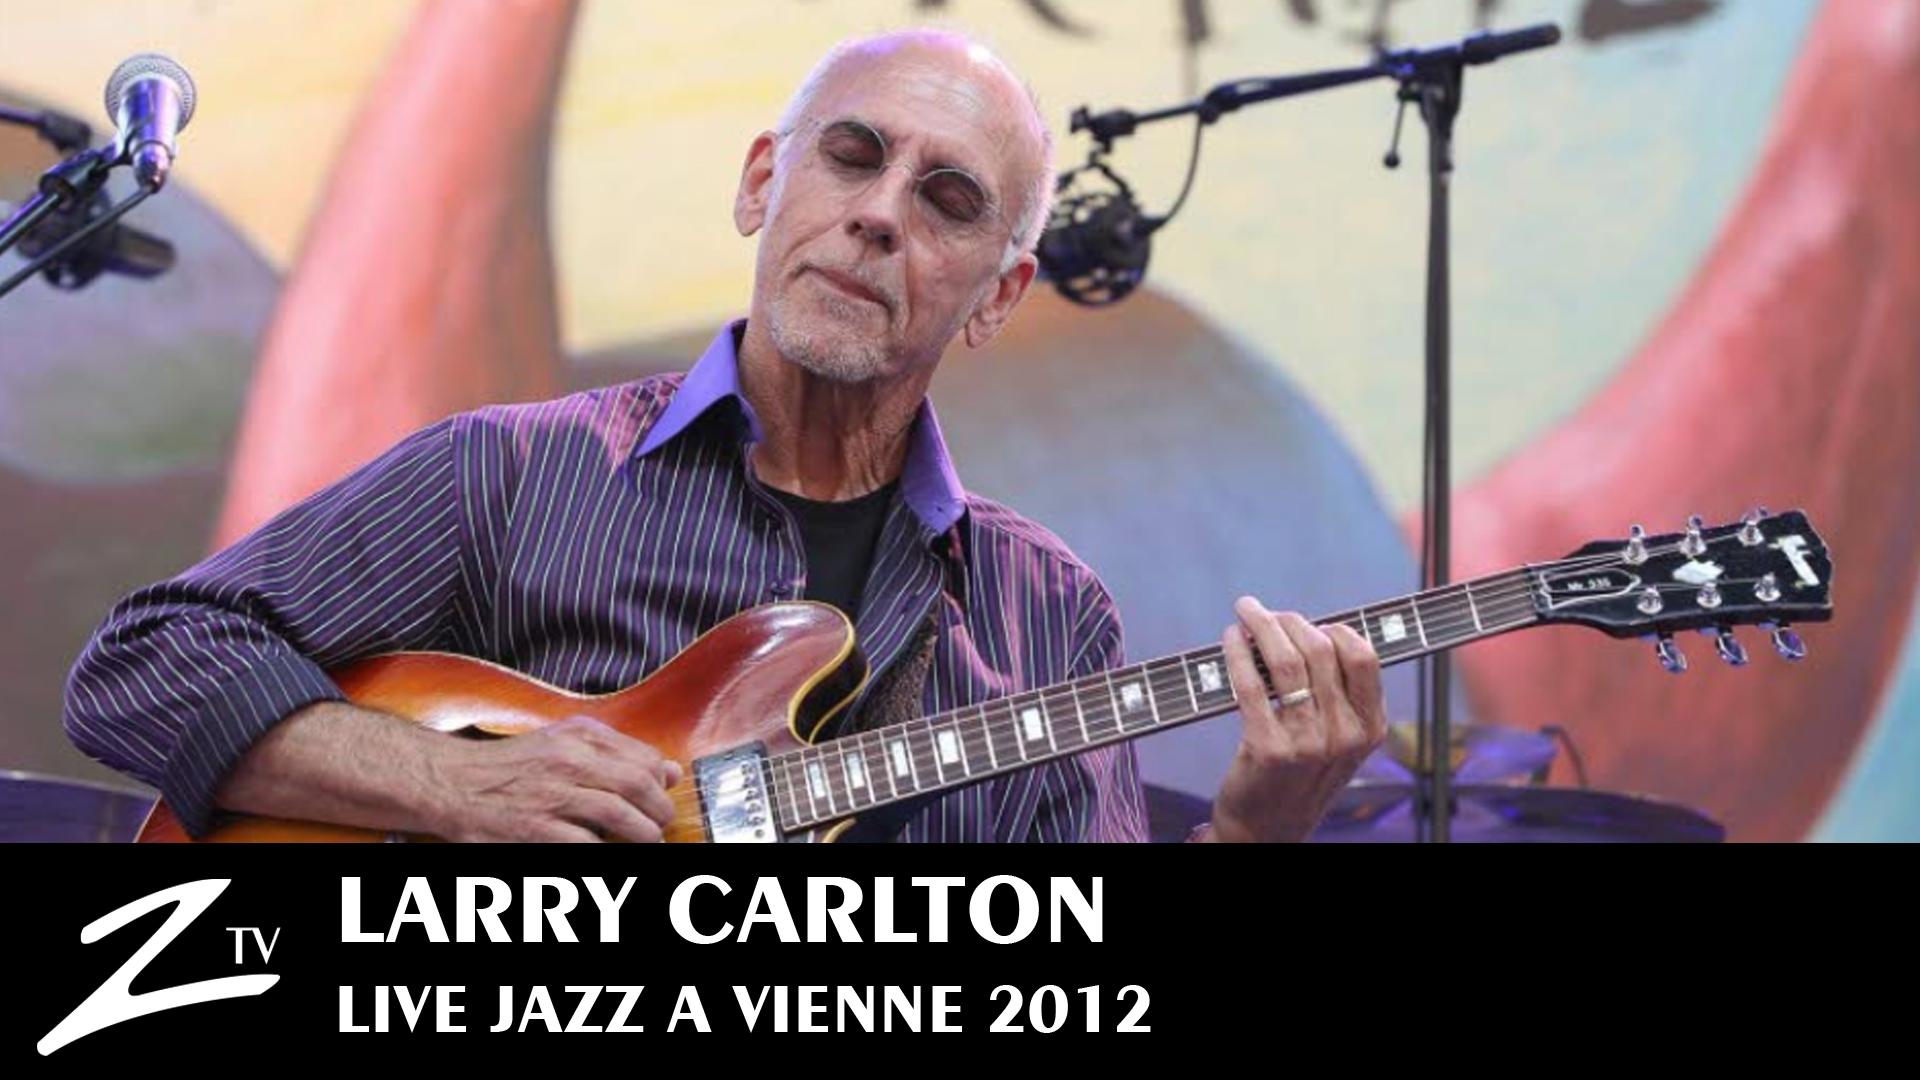 Larry Carlton